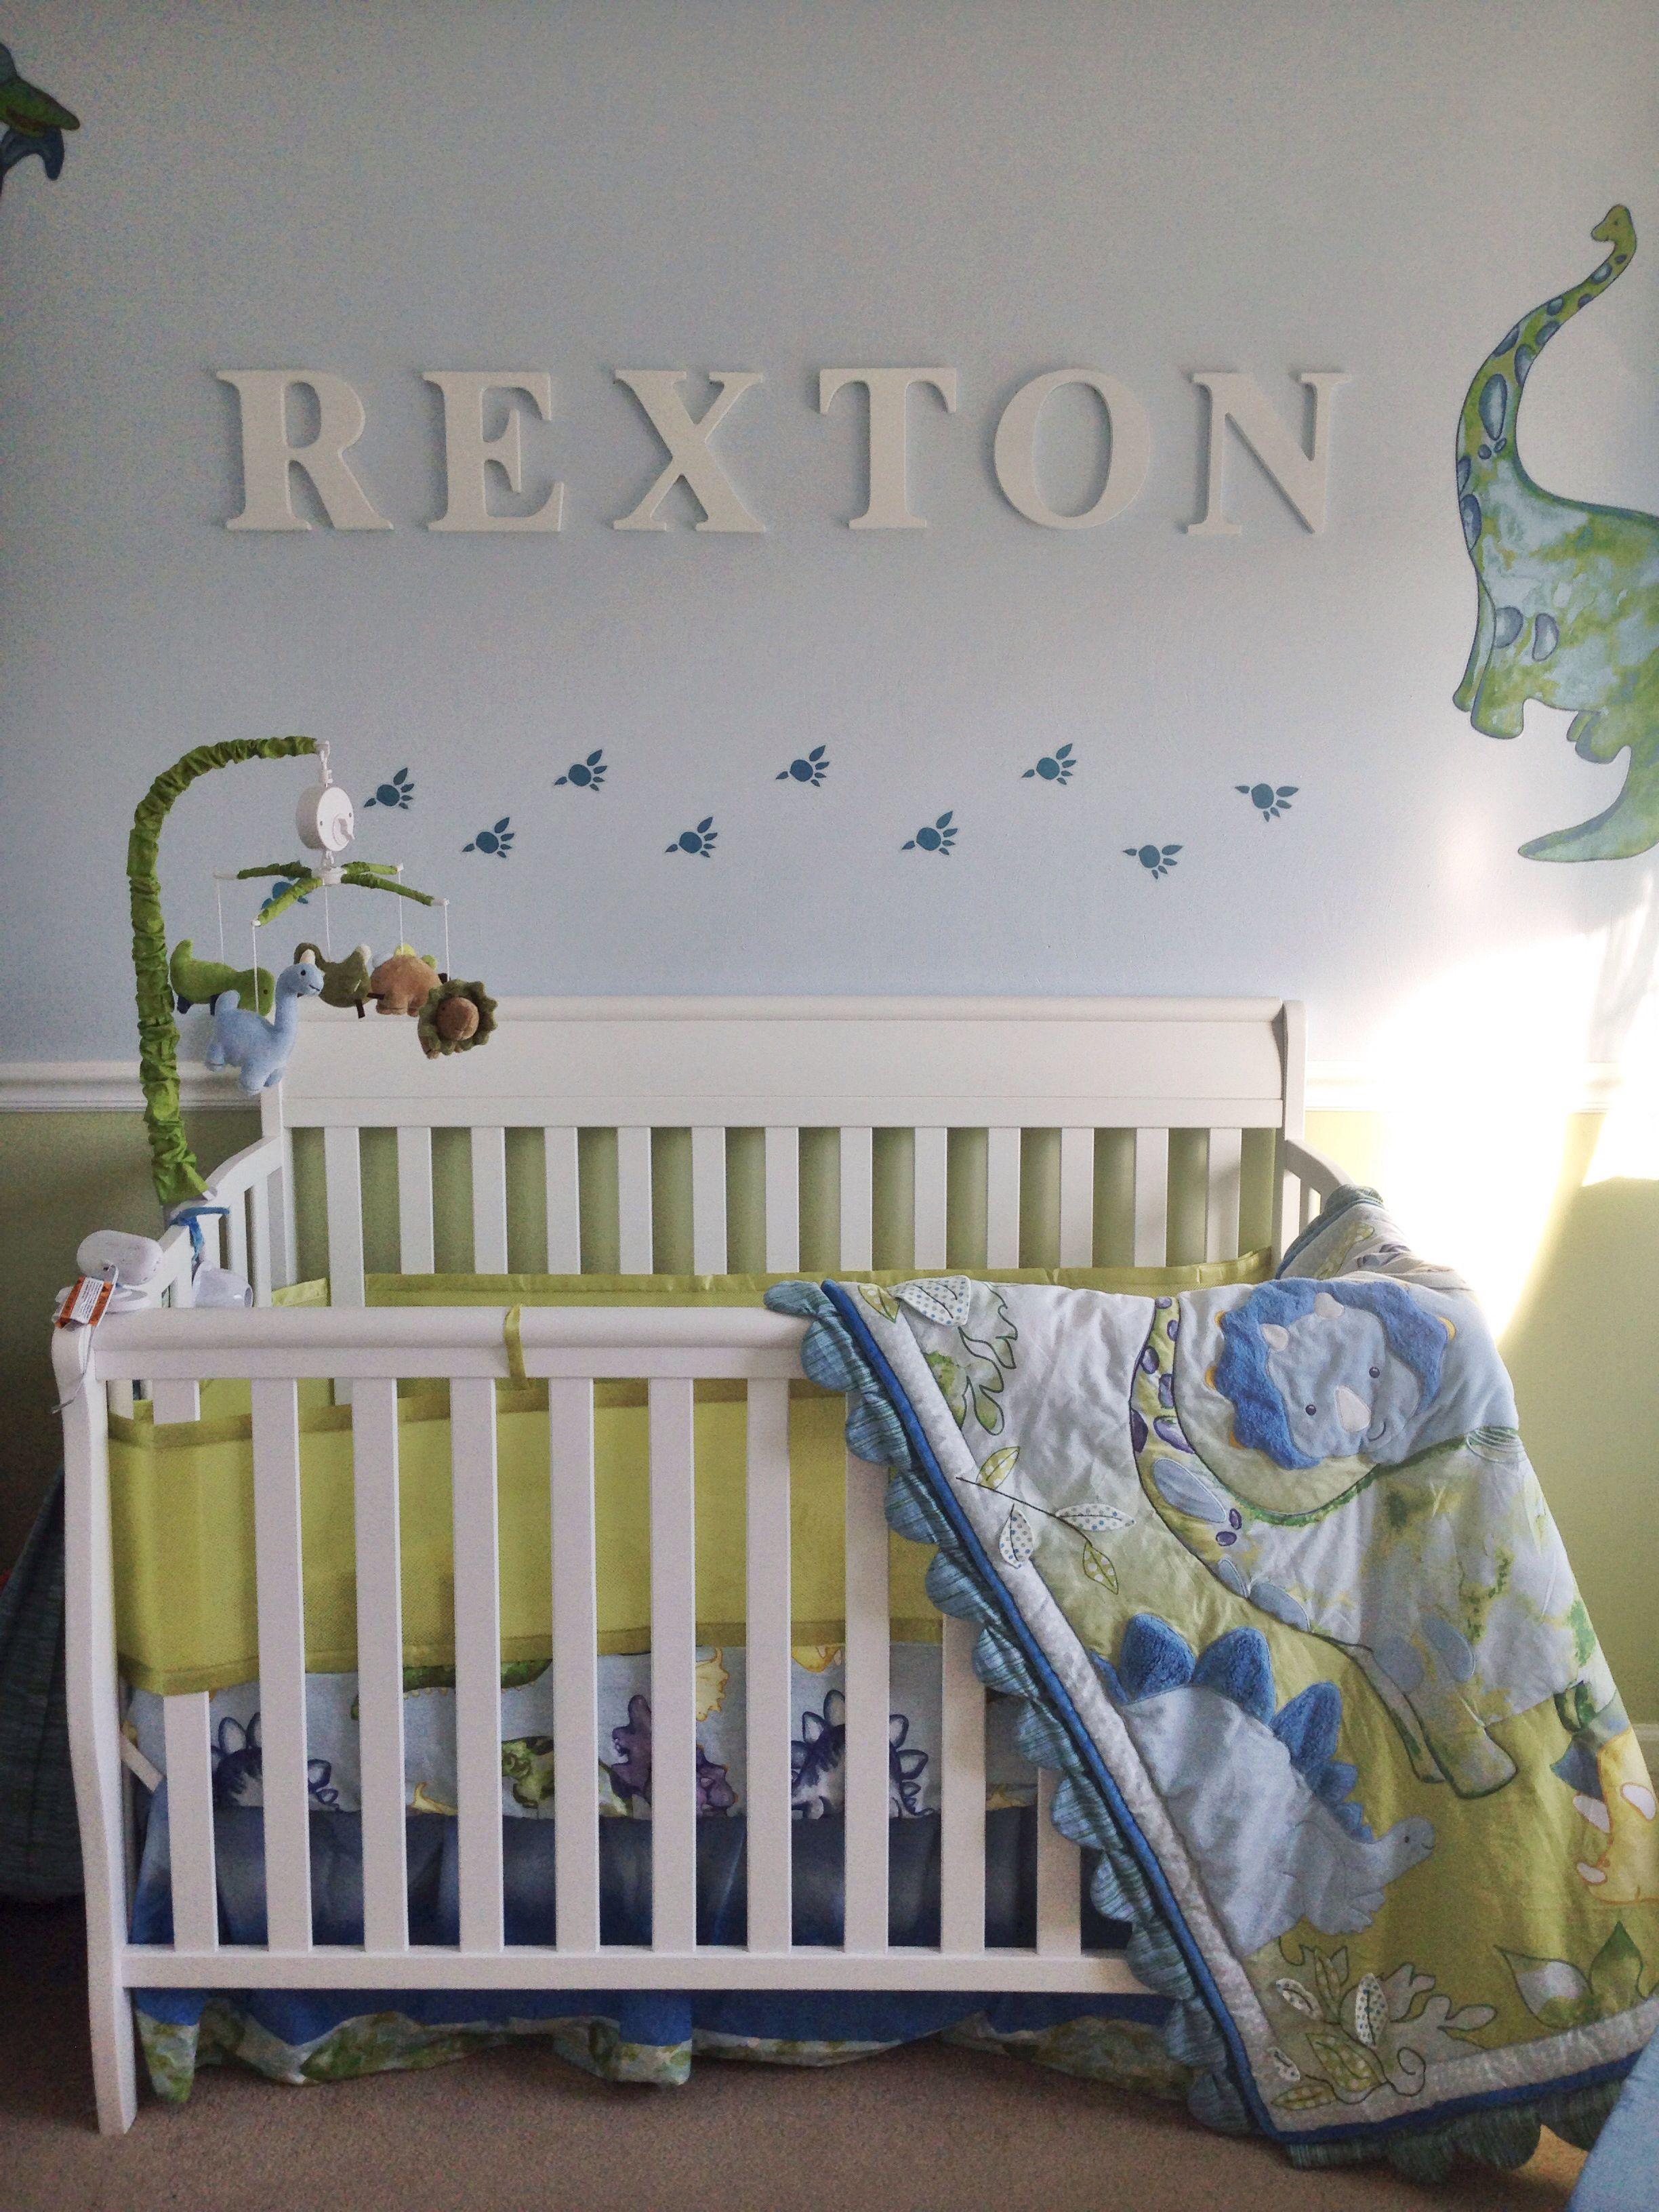 Rextonus crib rexton letters babies r us crib bedding u wall